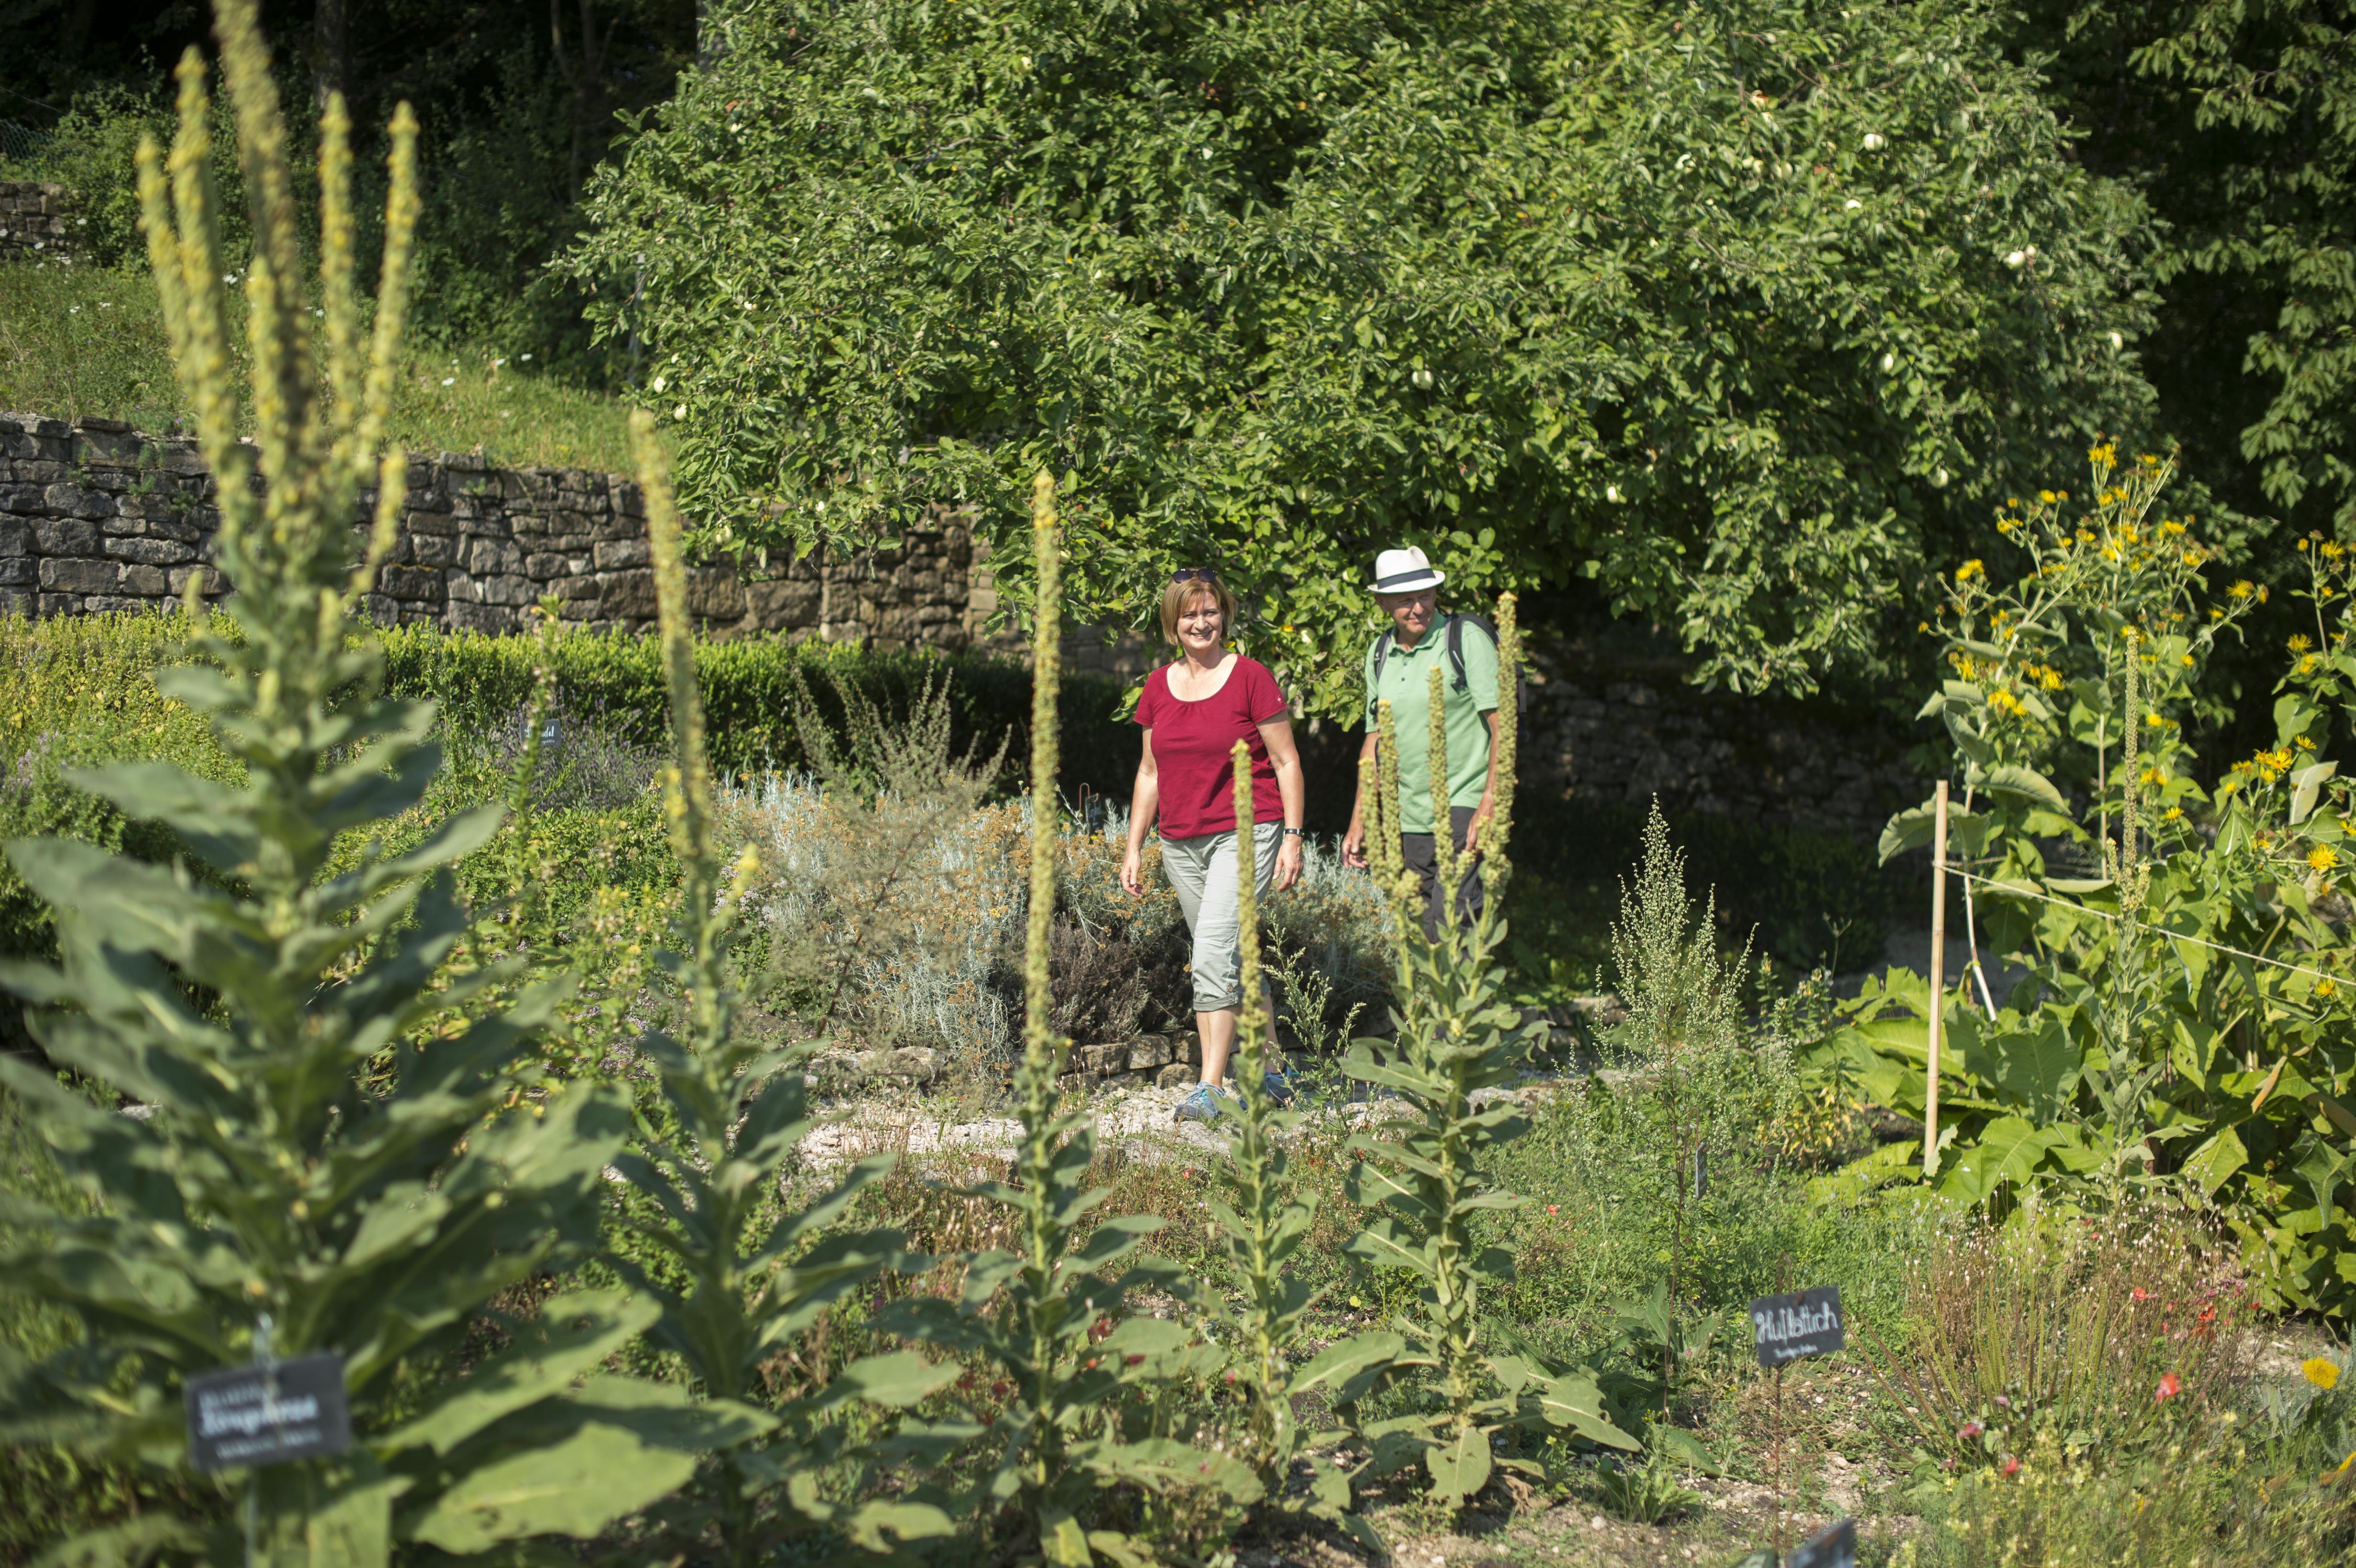 Kräutergarten mit Königskerzen